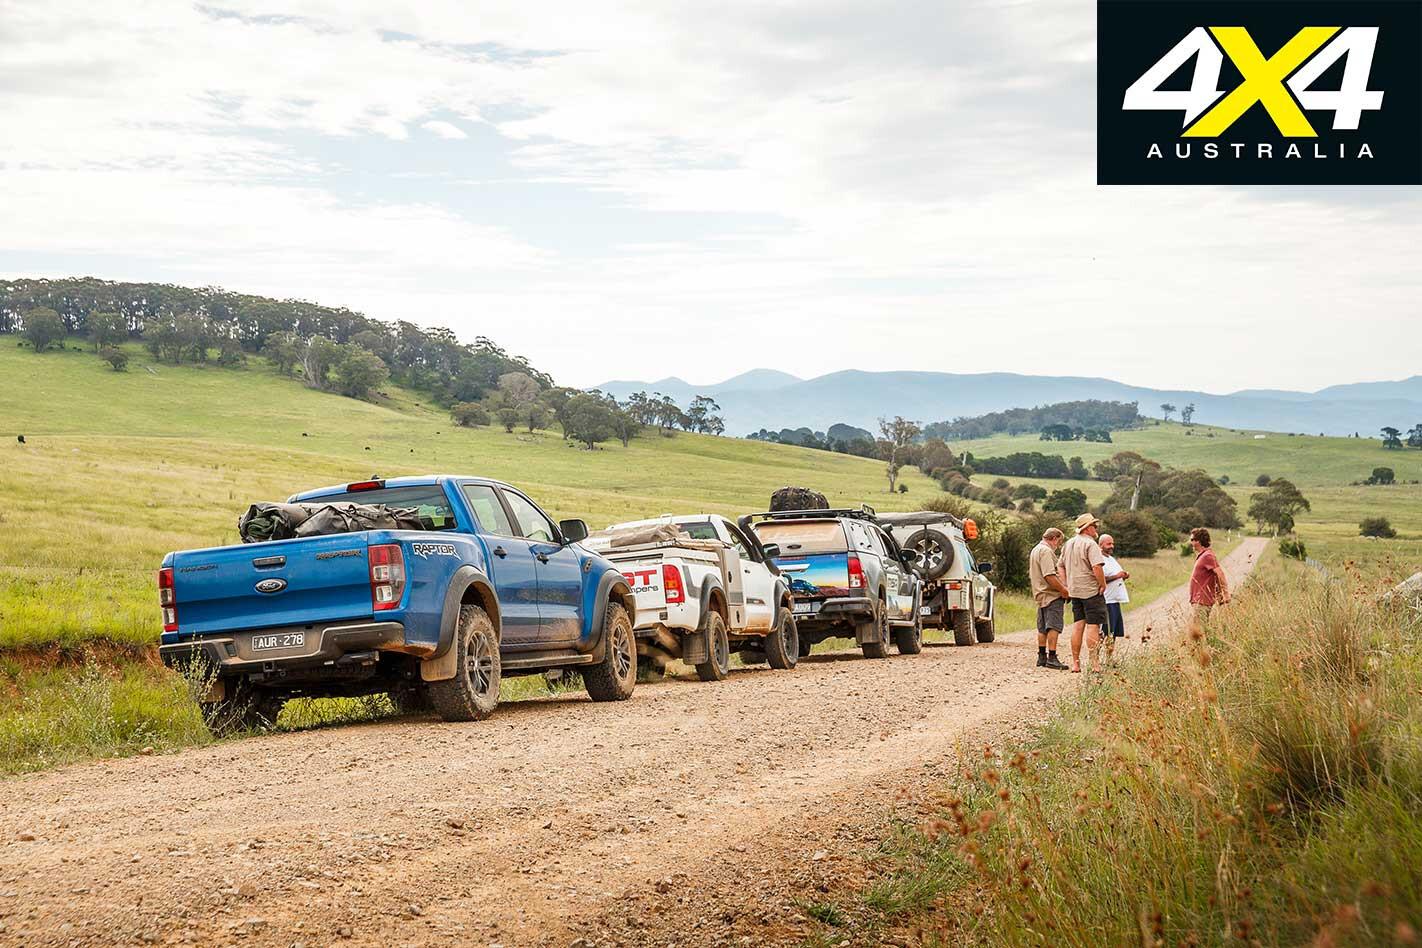 4 X 4 Convoy South Coast NSW Jpg